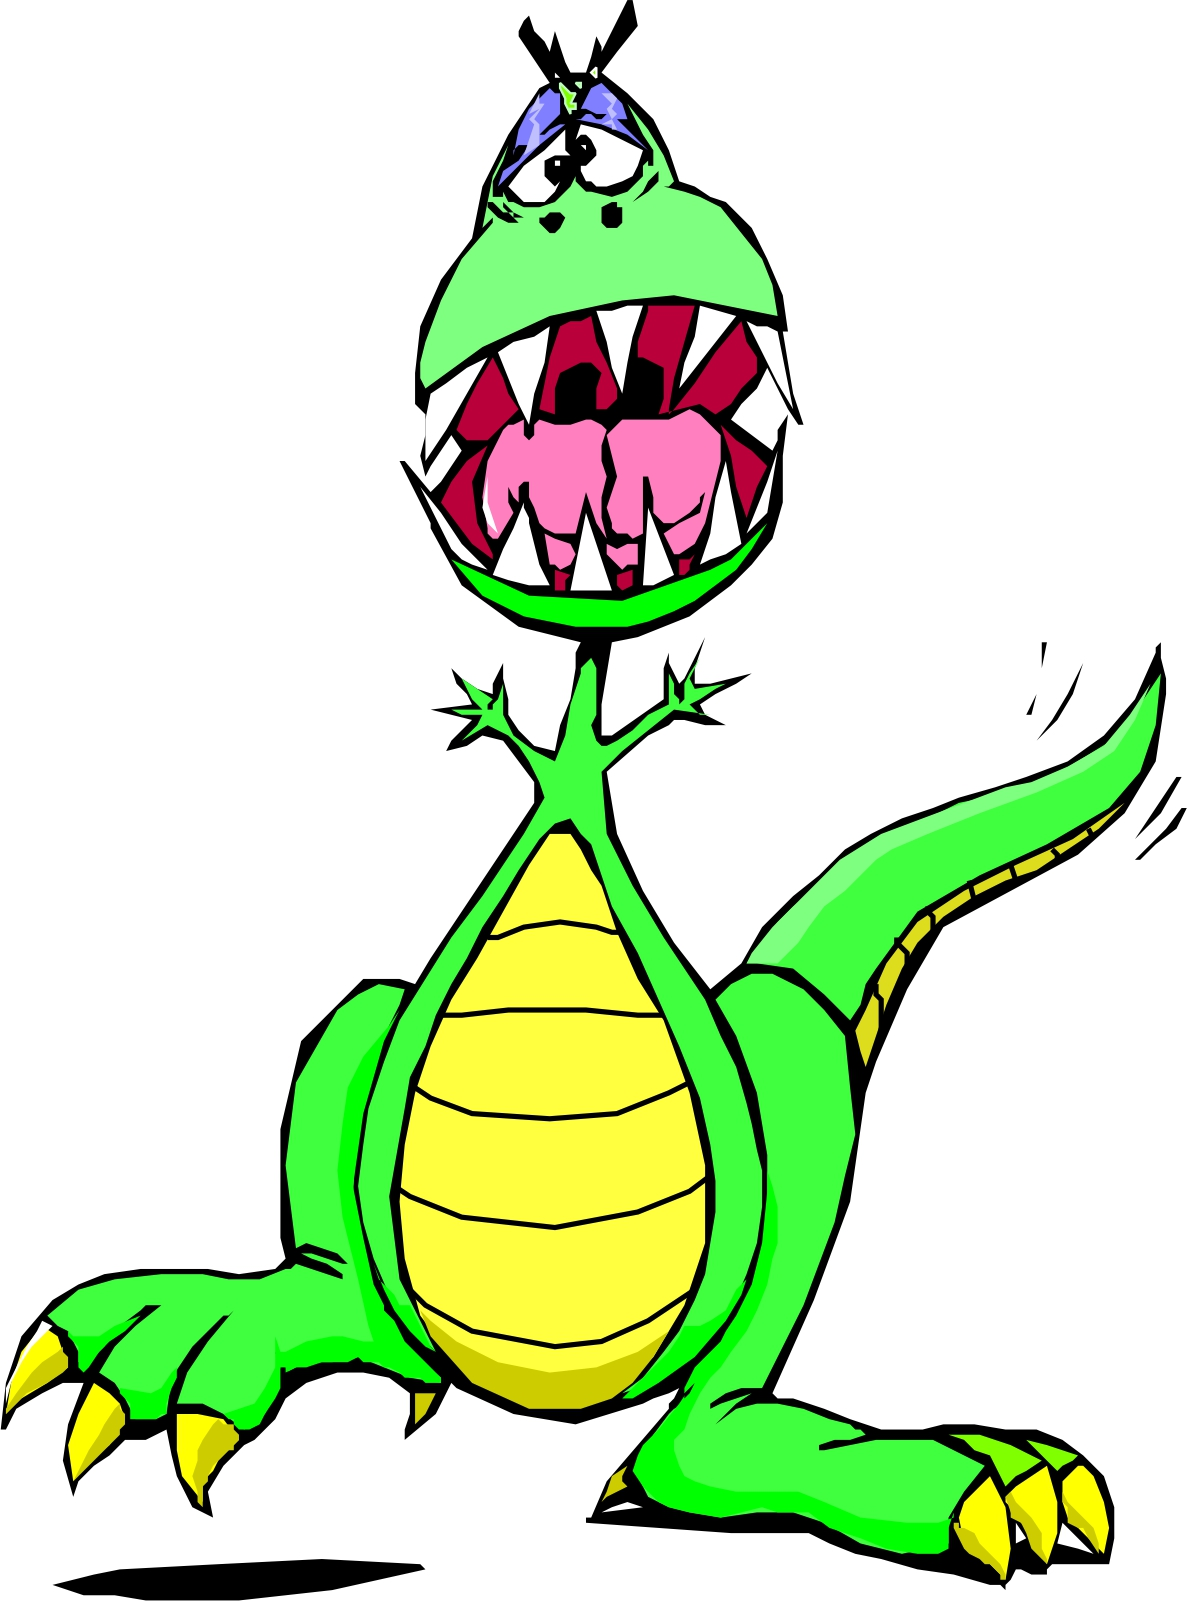 Scary cartoon dinosaur.